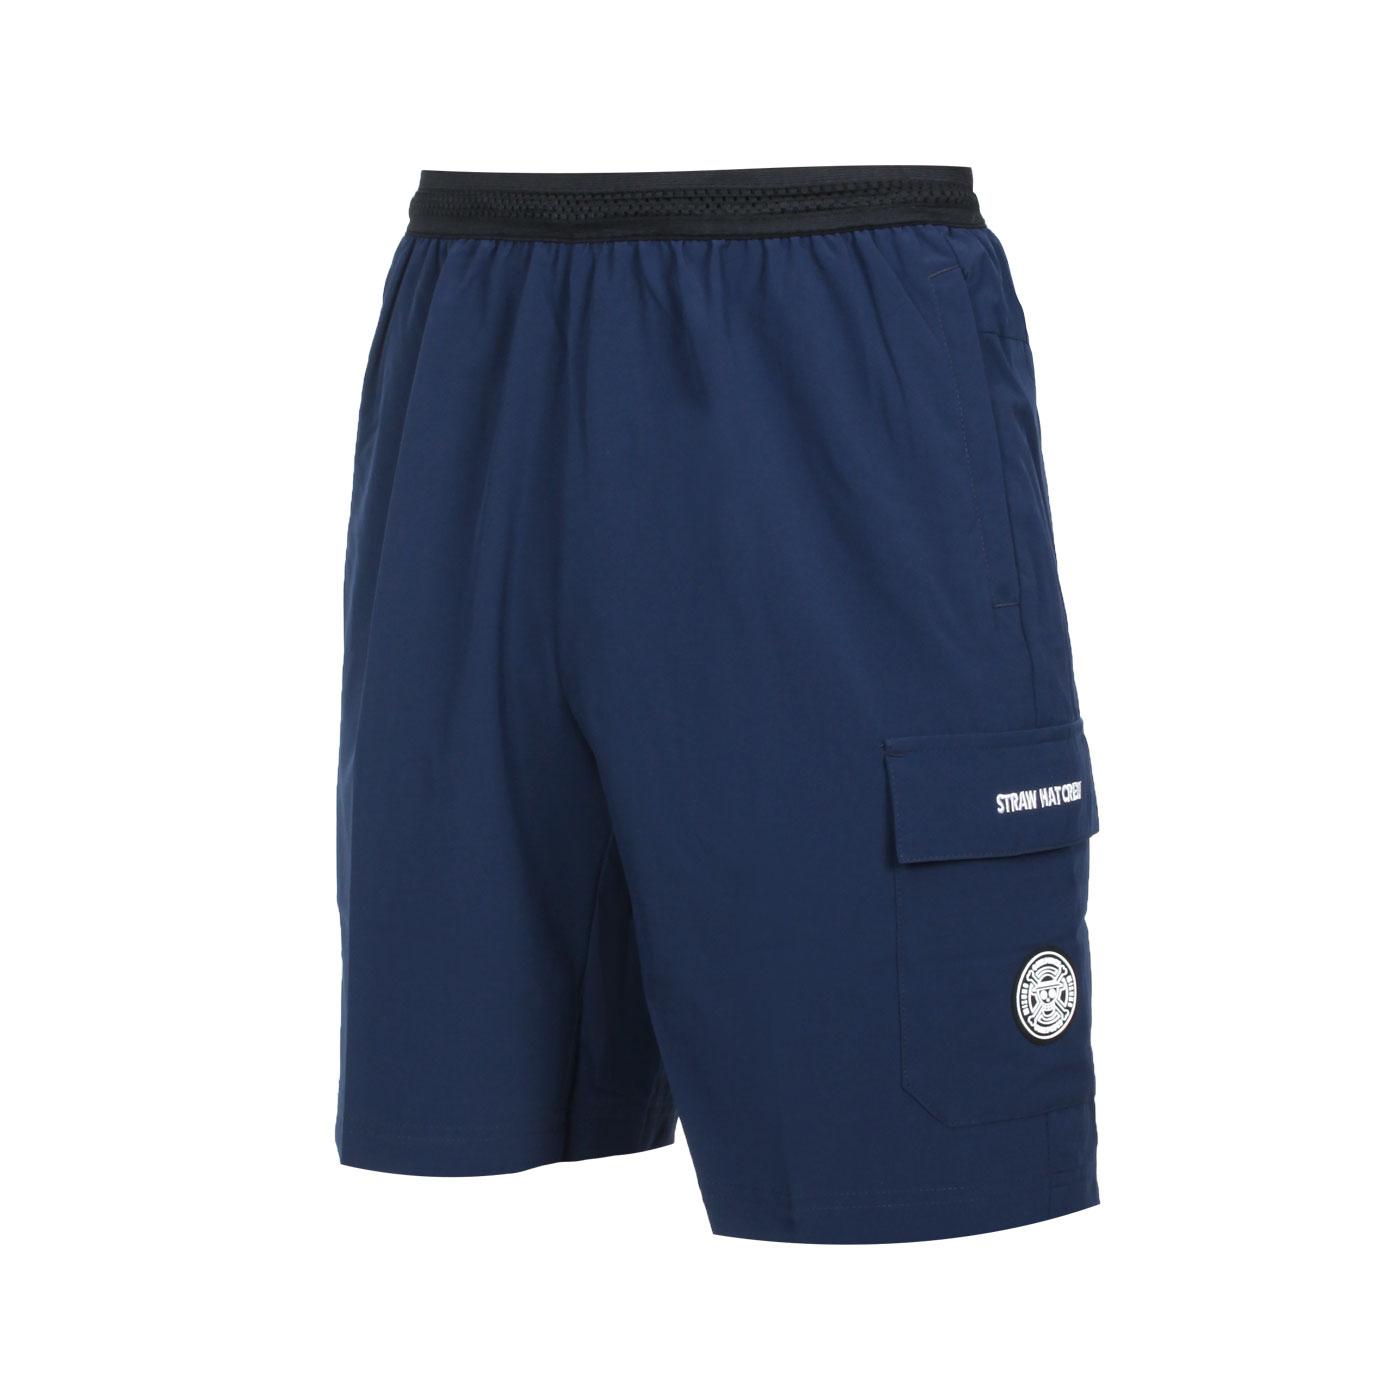 MIZUNO 男平織短褲(海賊王聯名款) D2TB155714 - 丈青白